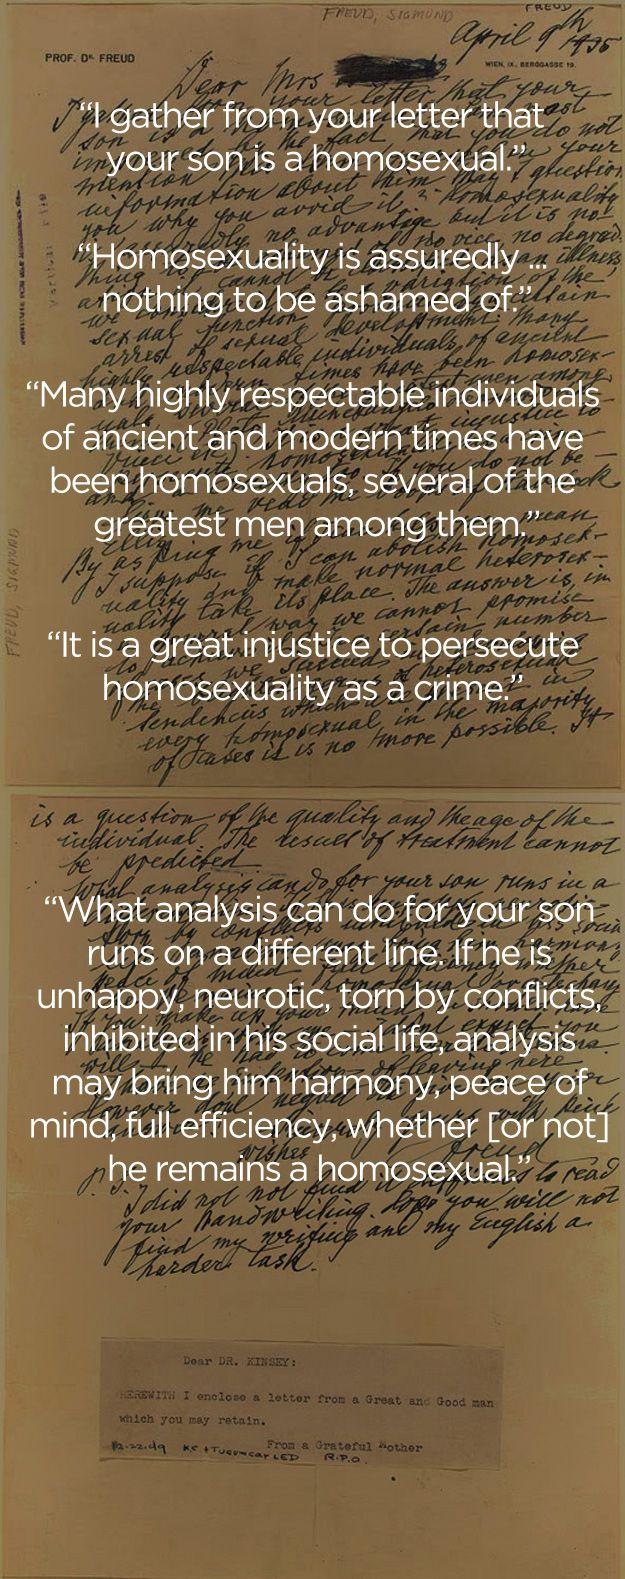 Sigmund Freudu0027s Letter Regarding Homosexuality Sigmund Freudu0027s